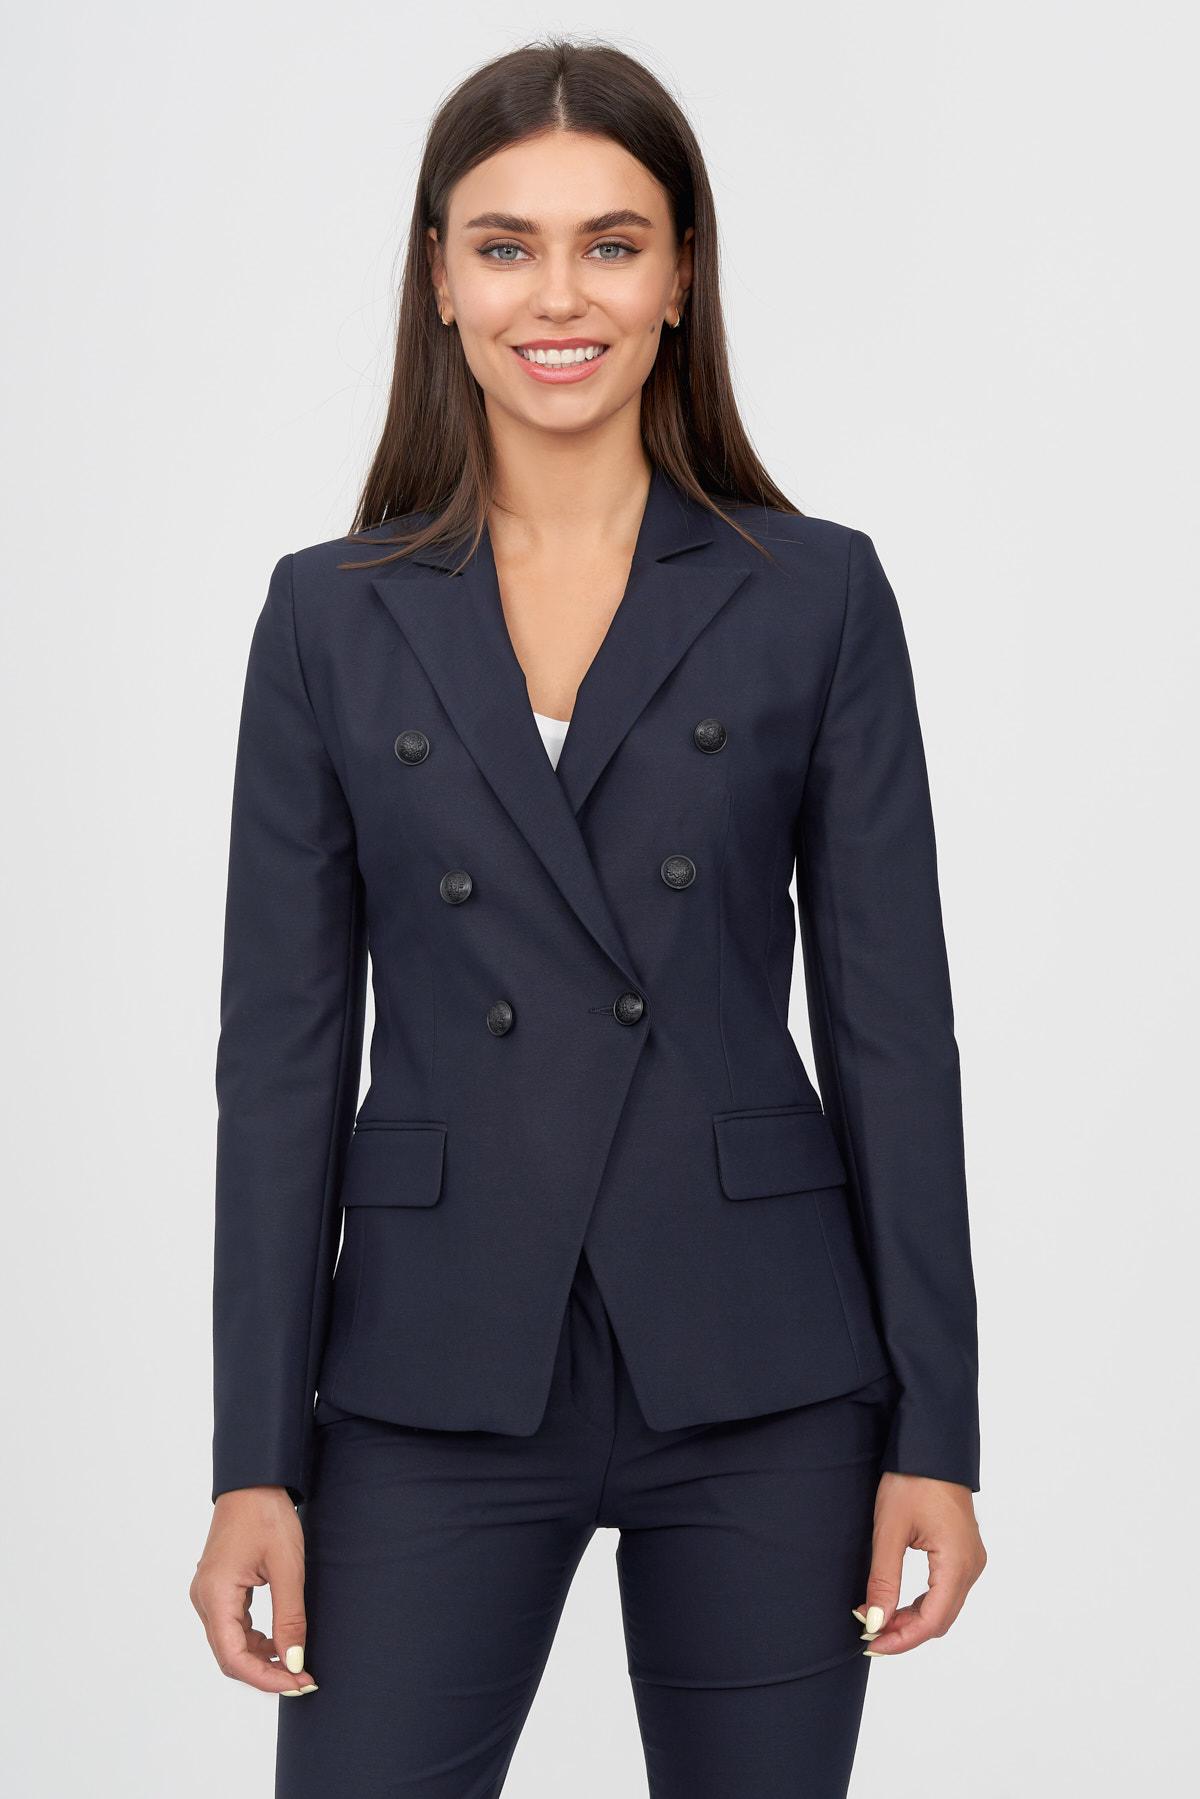 Жакет женские Natali Bolgar модель 17084MAD77 цена, 2017